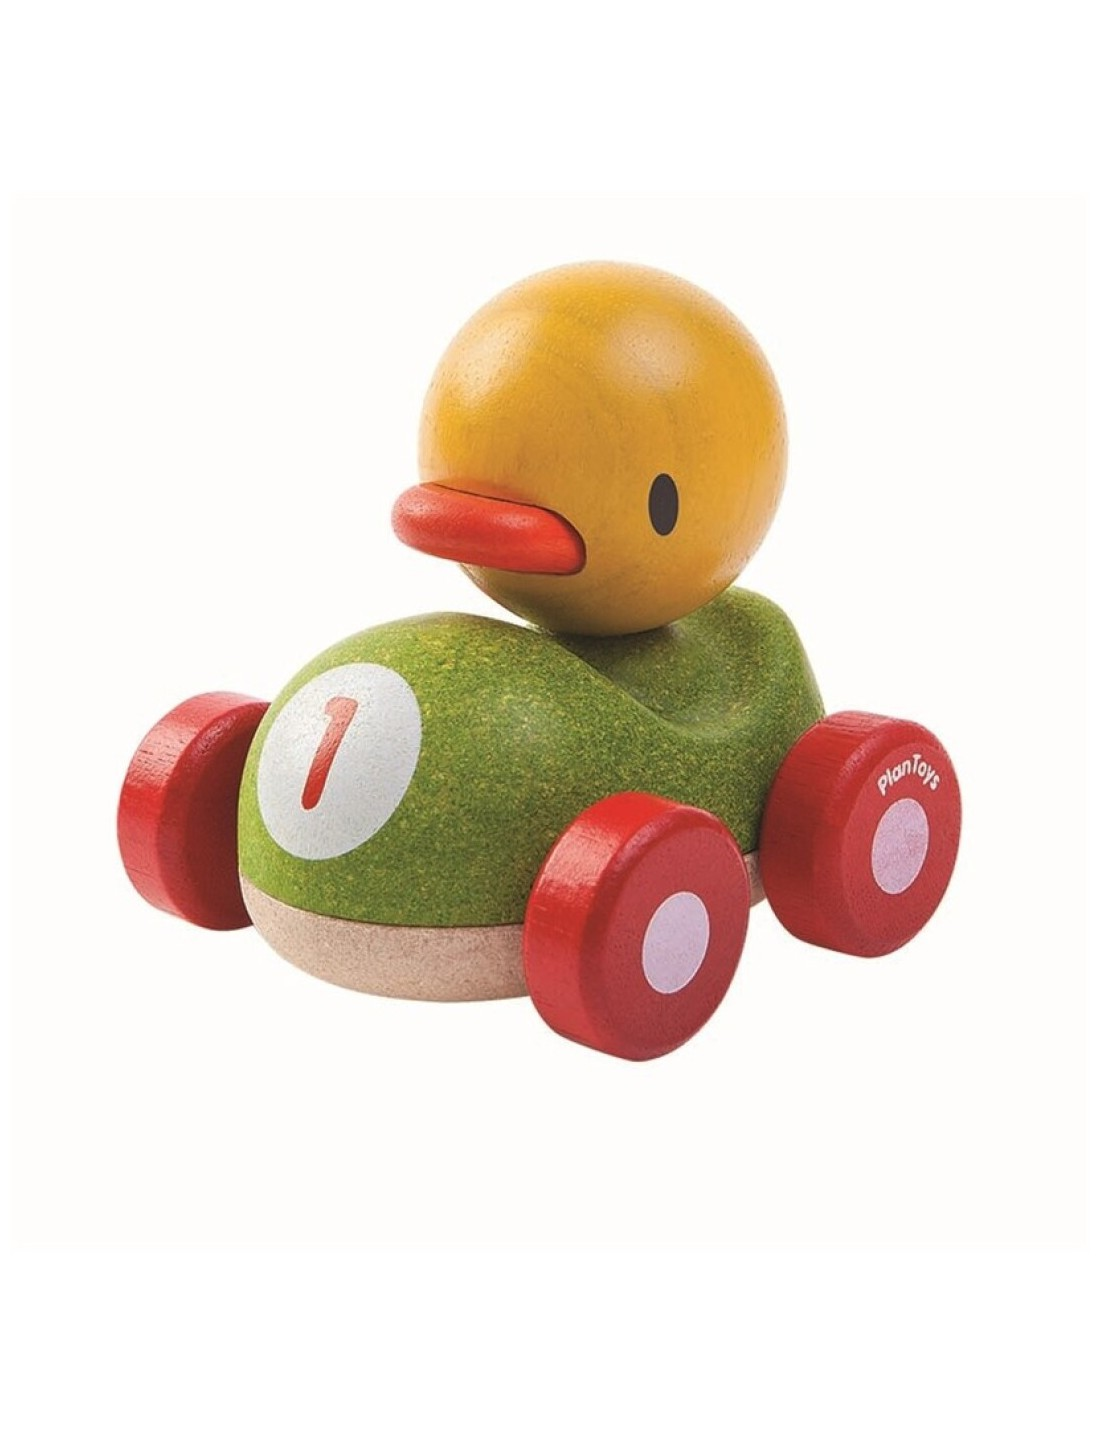 Pato el piloto. Plan Toys